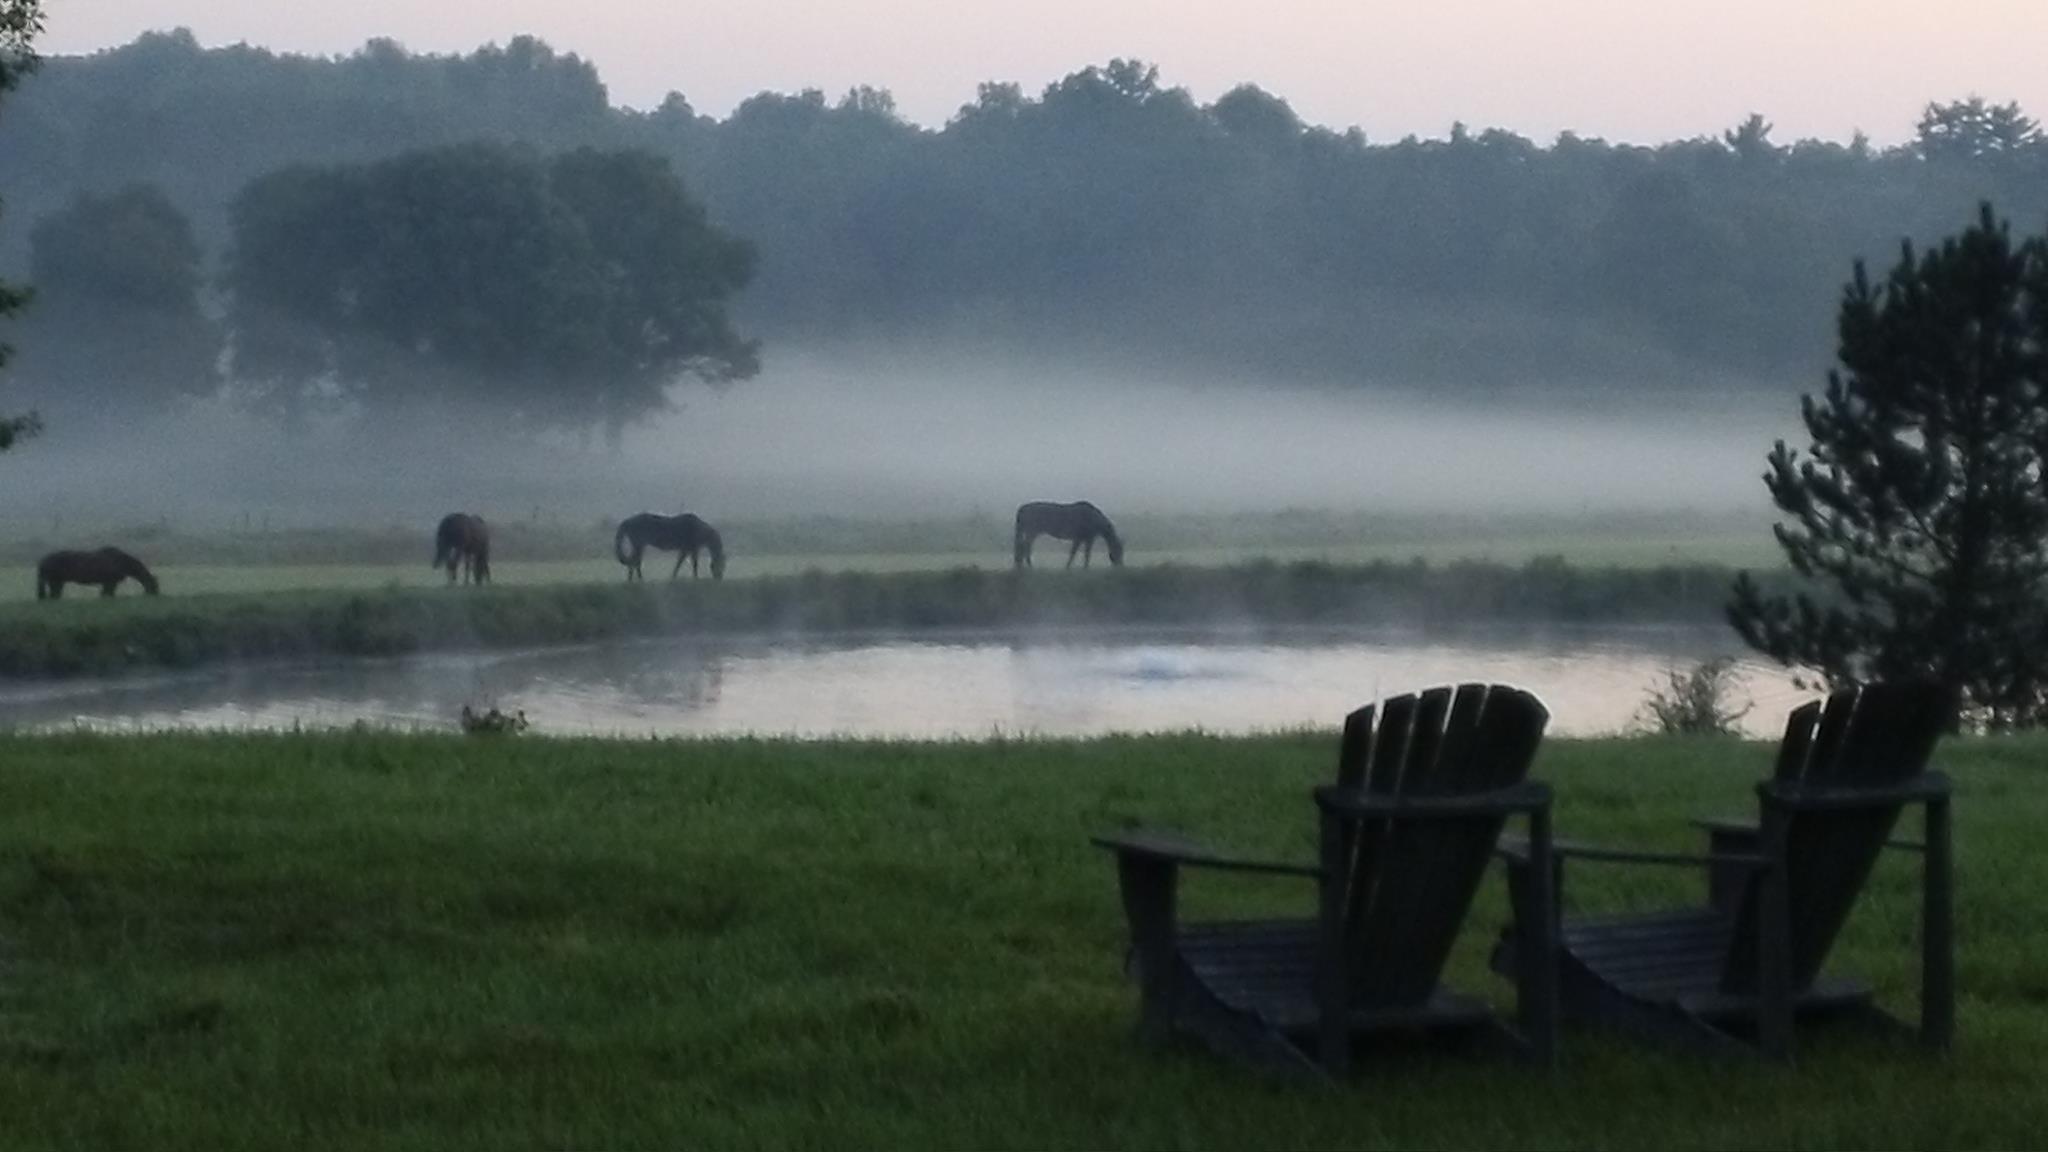 Asaph Drake horses